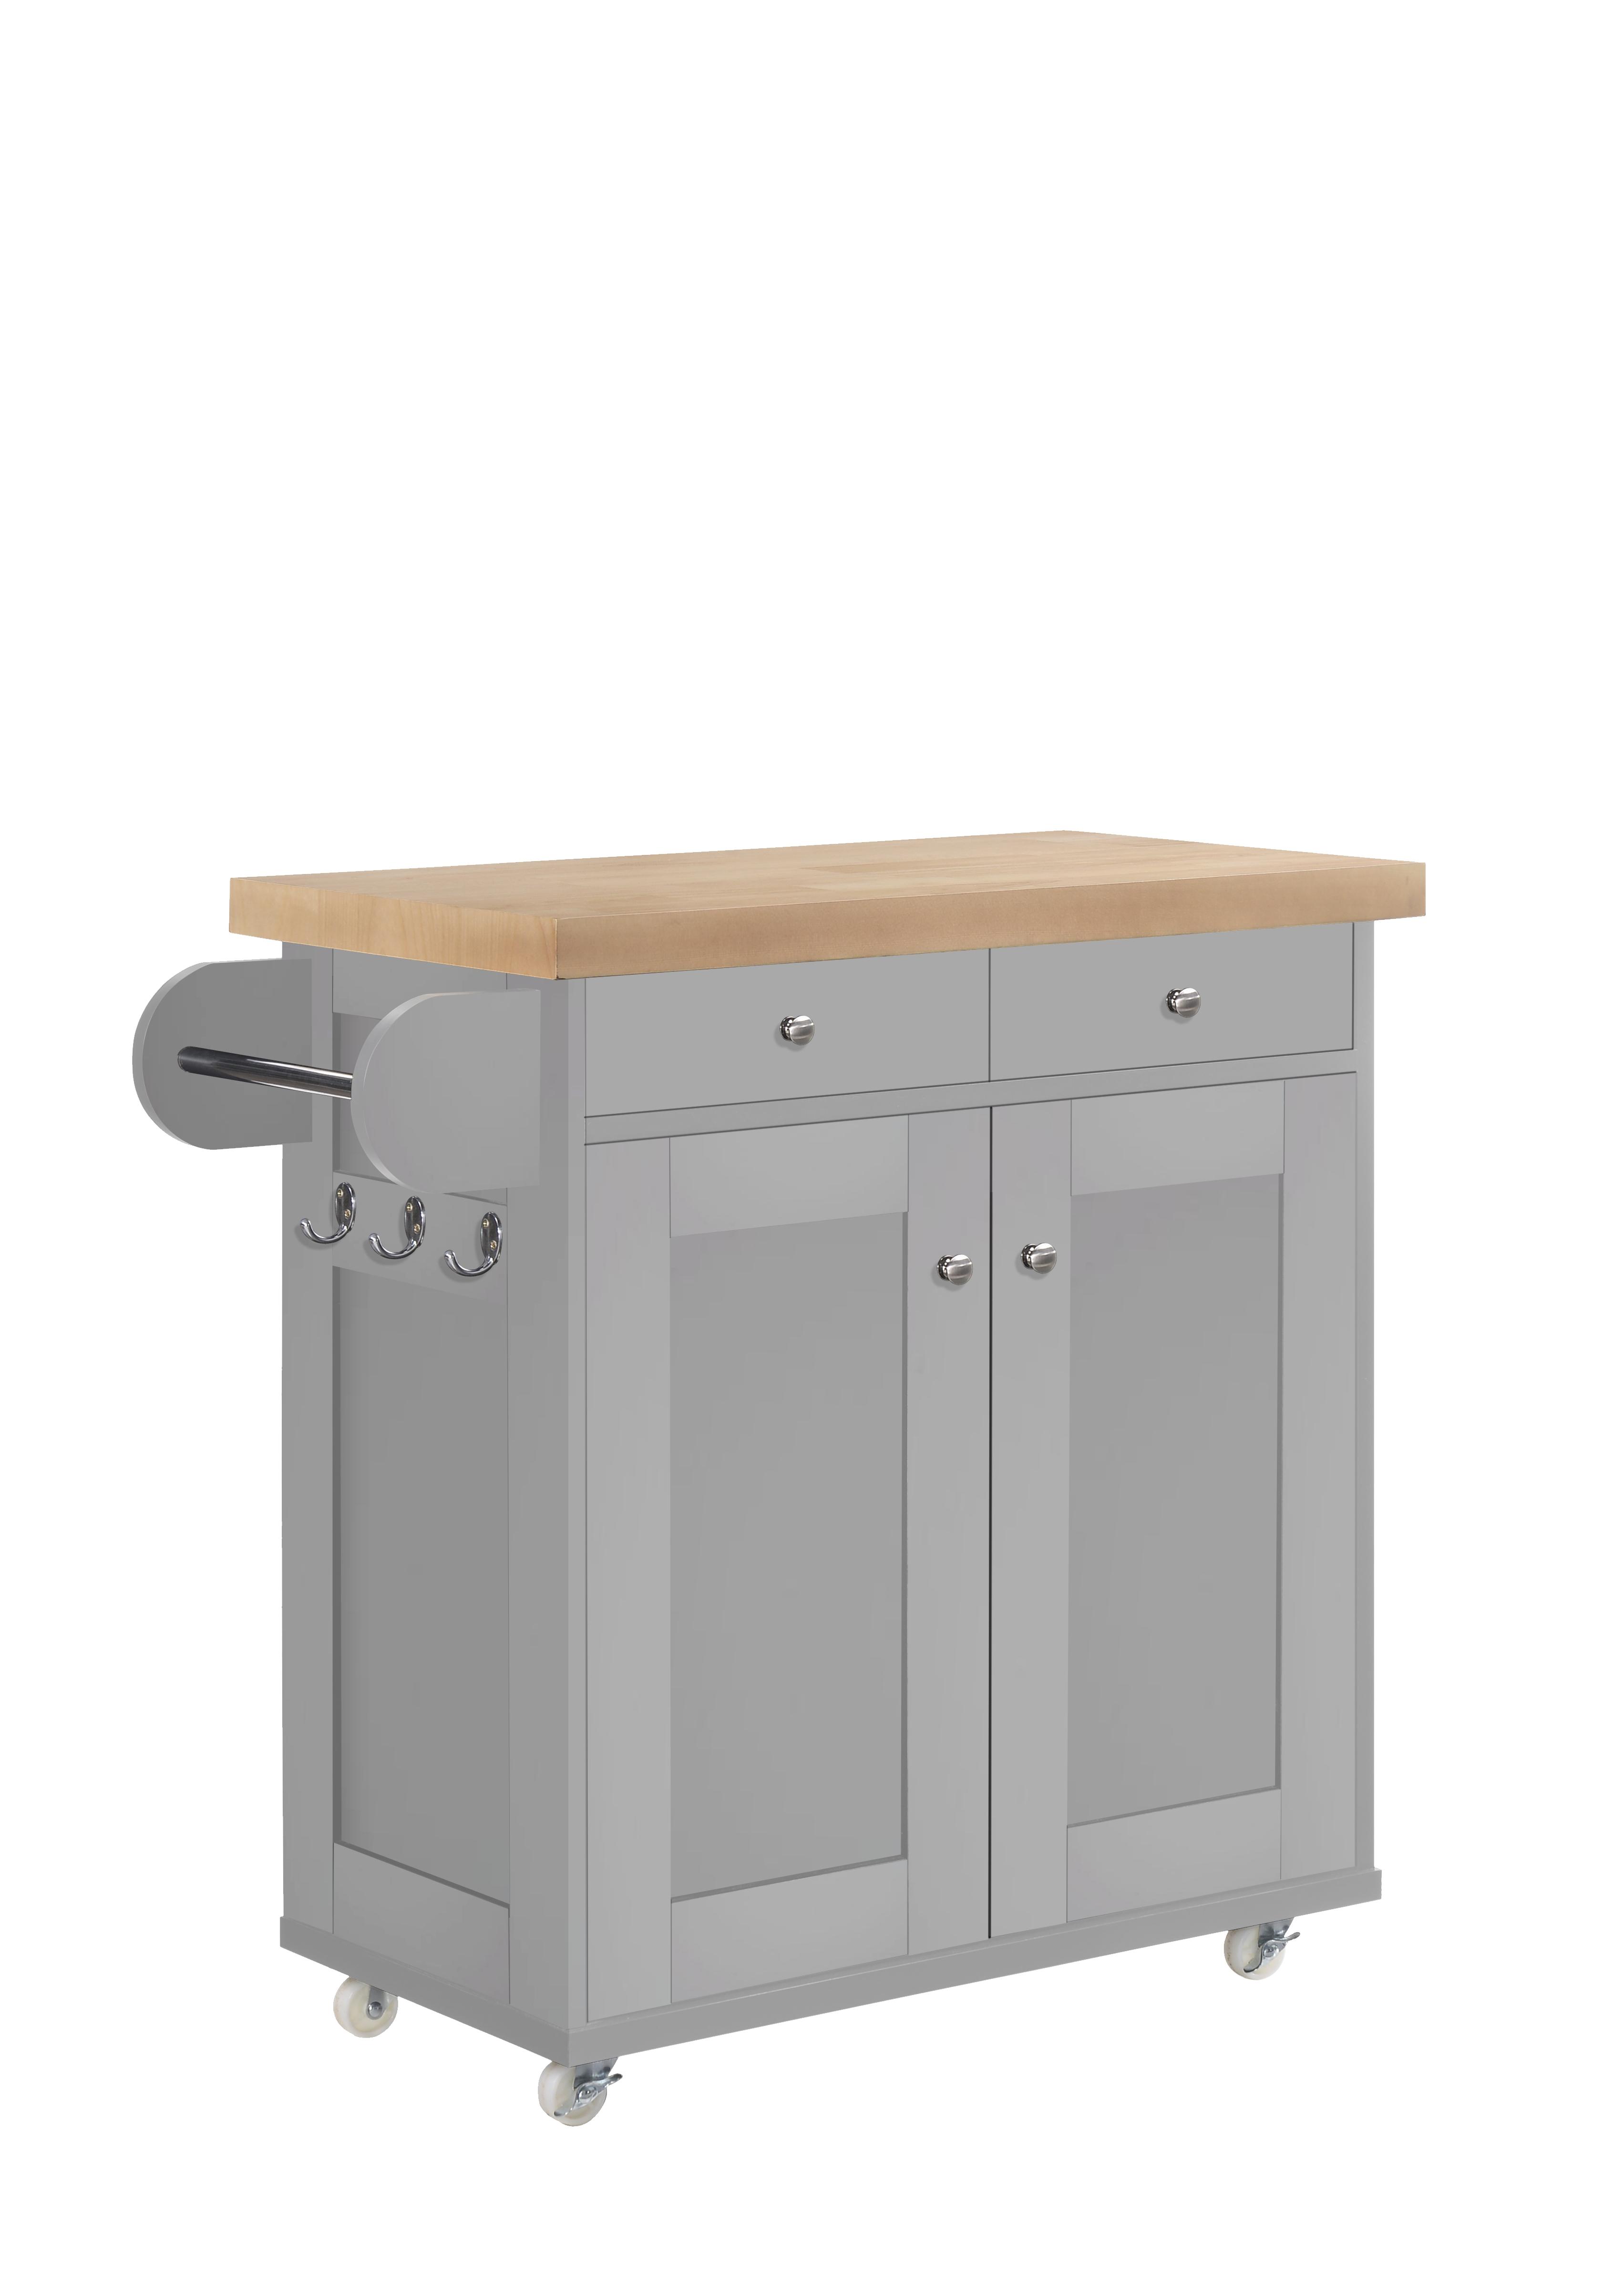 Portable kitchen island trolley cart on wheels with cupboard storage grey